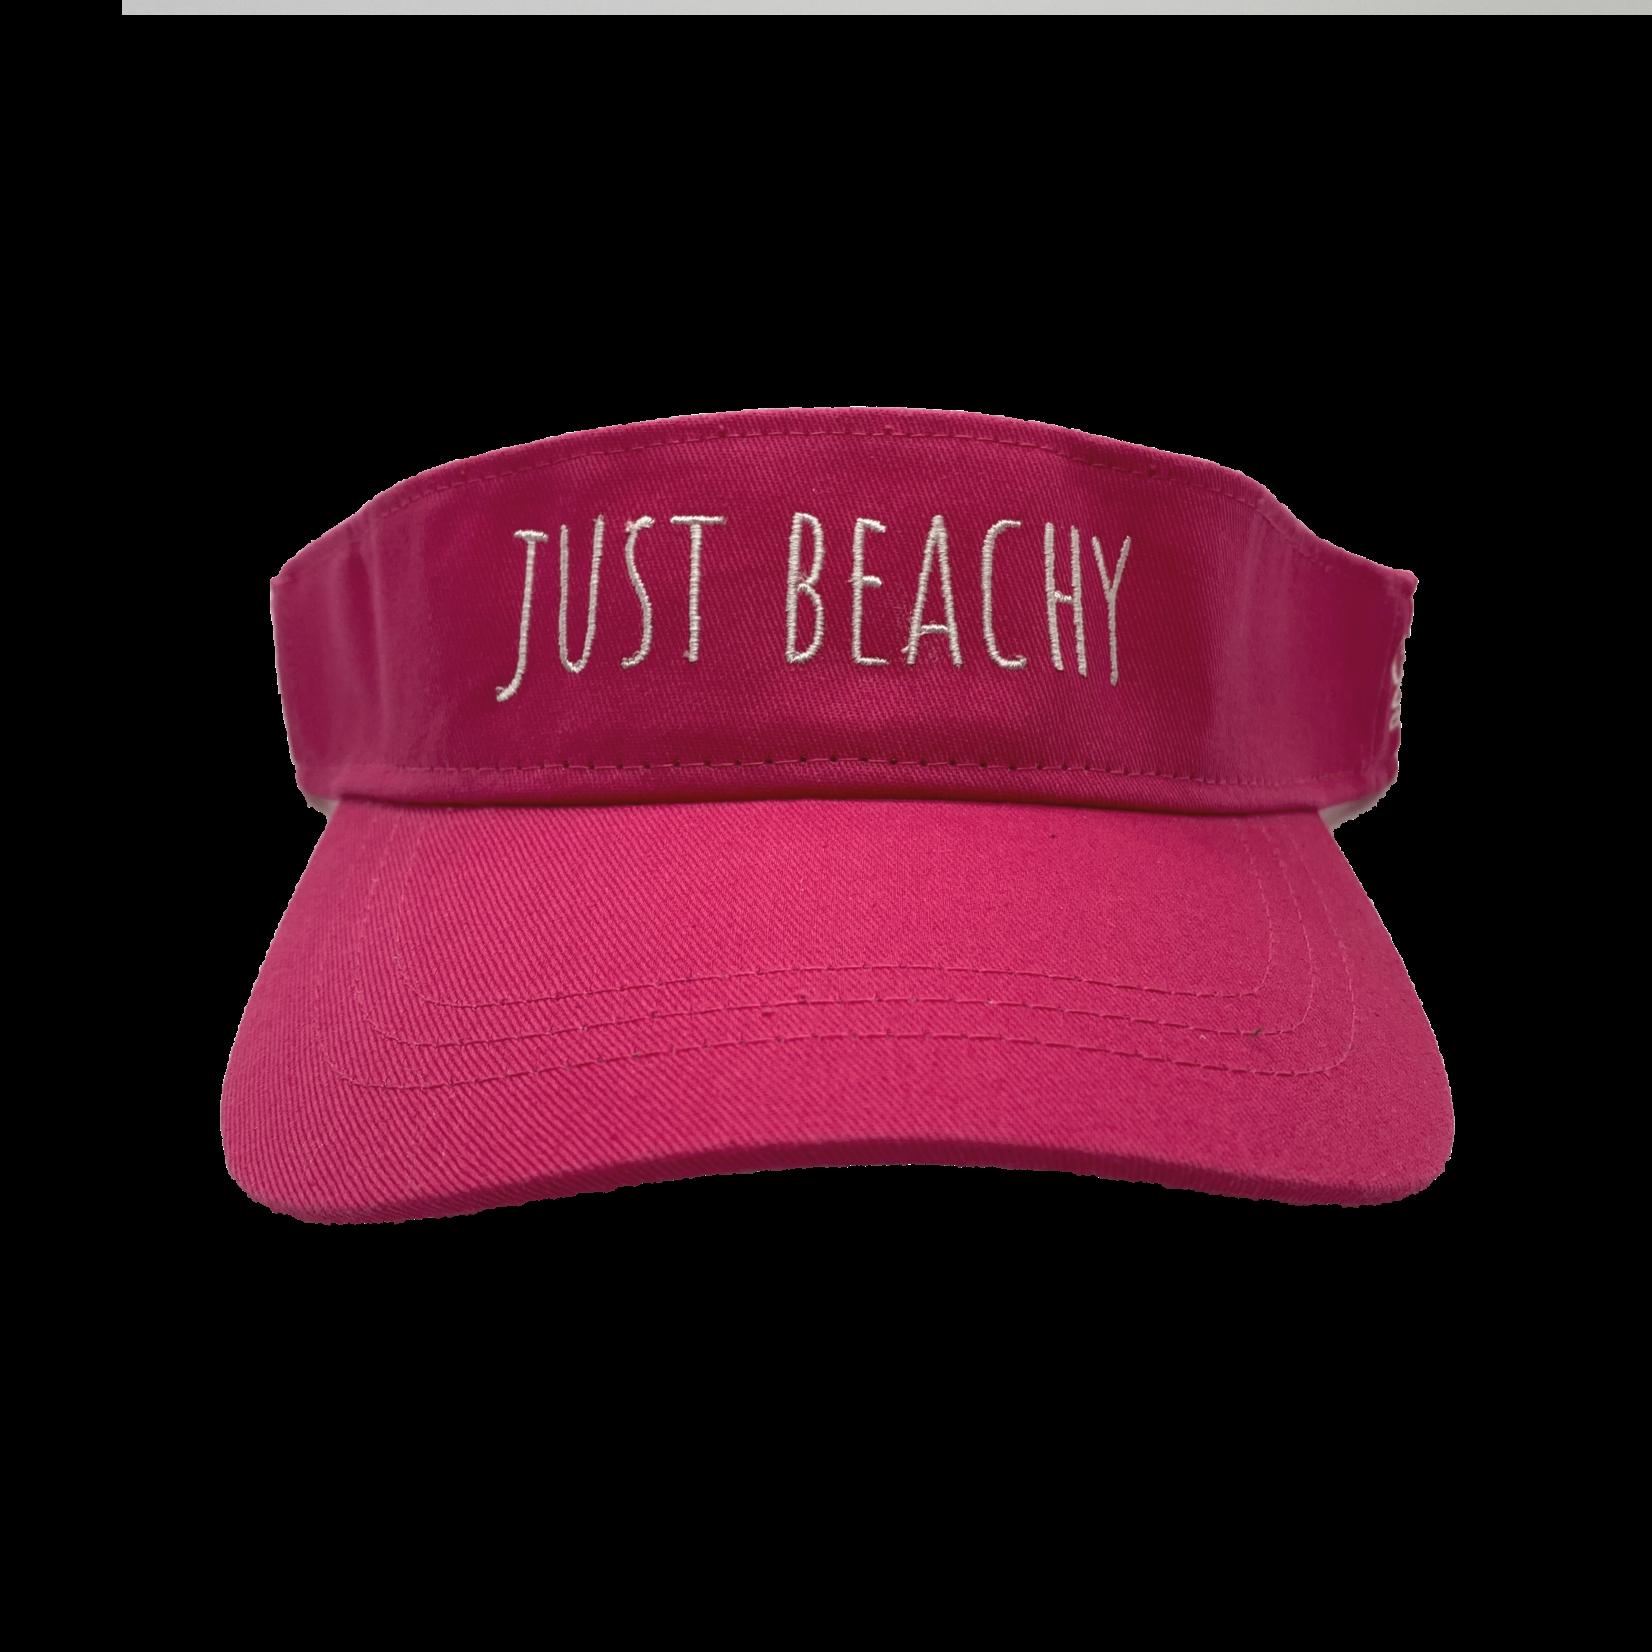 Just Beachy Visor